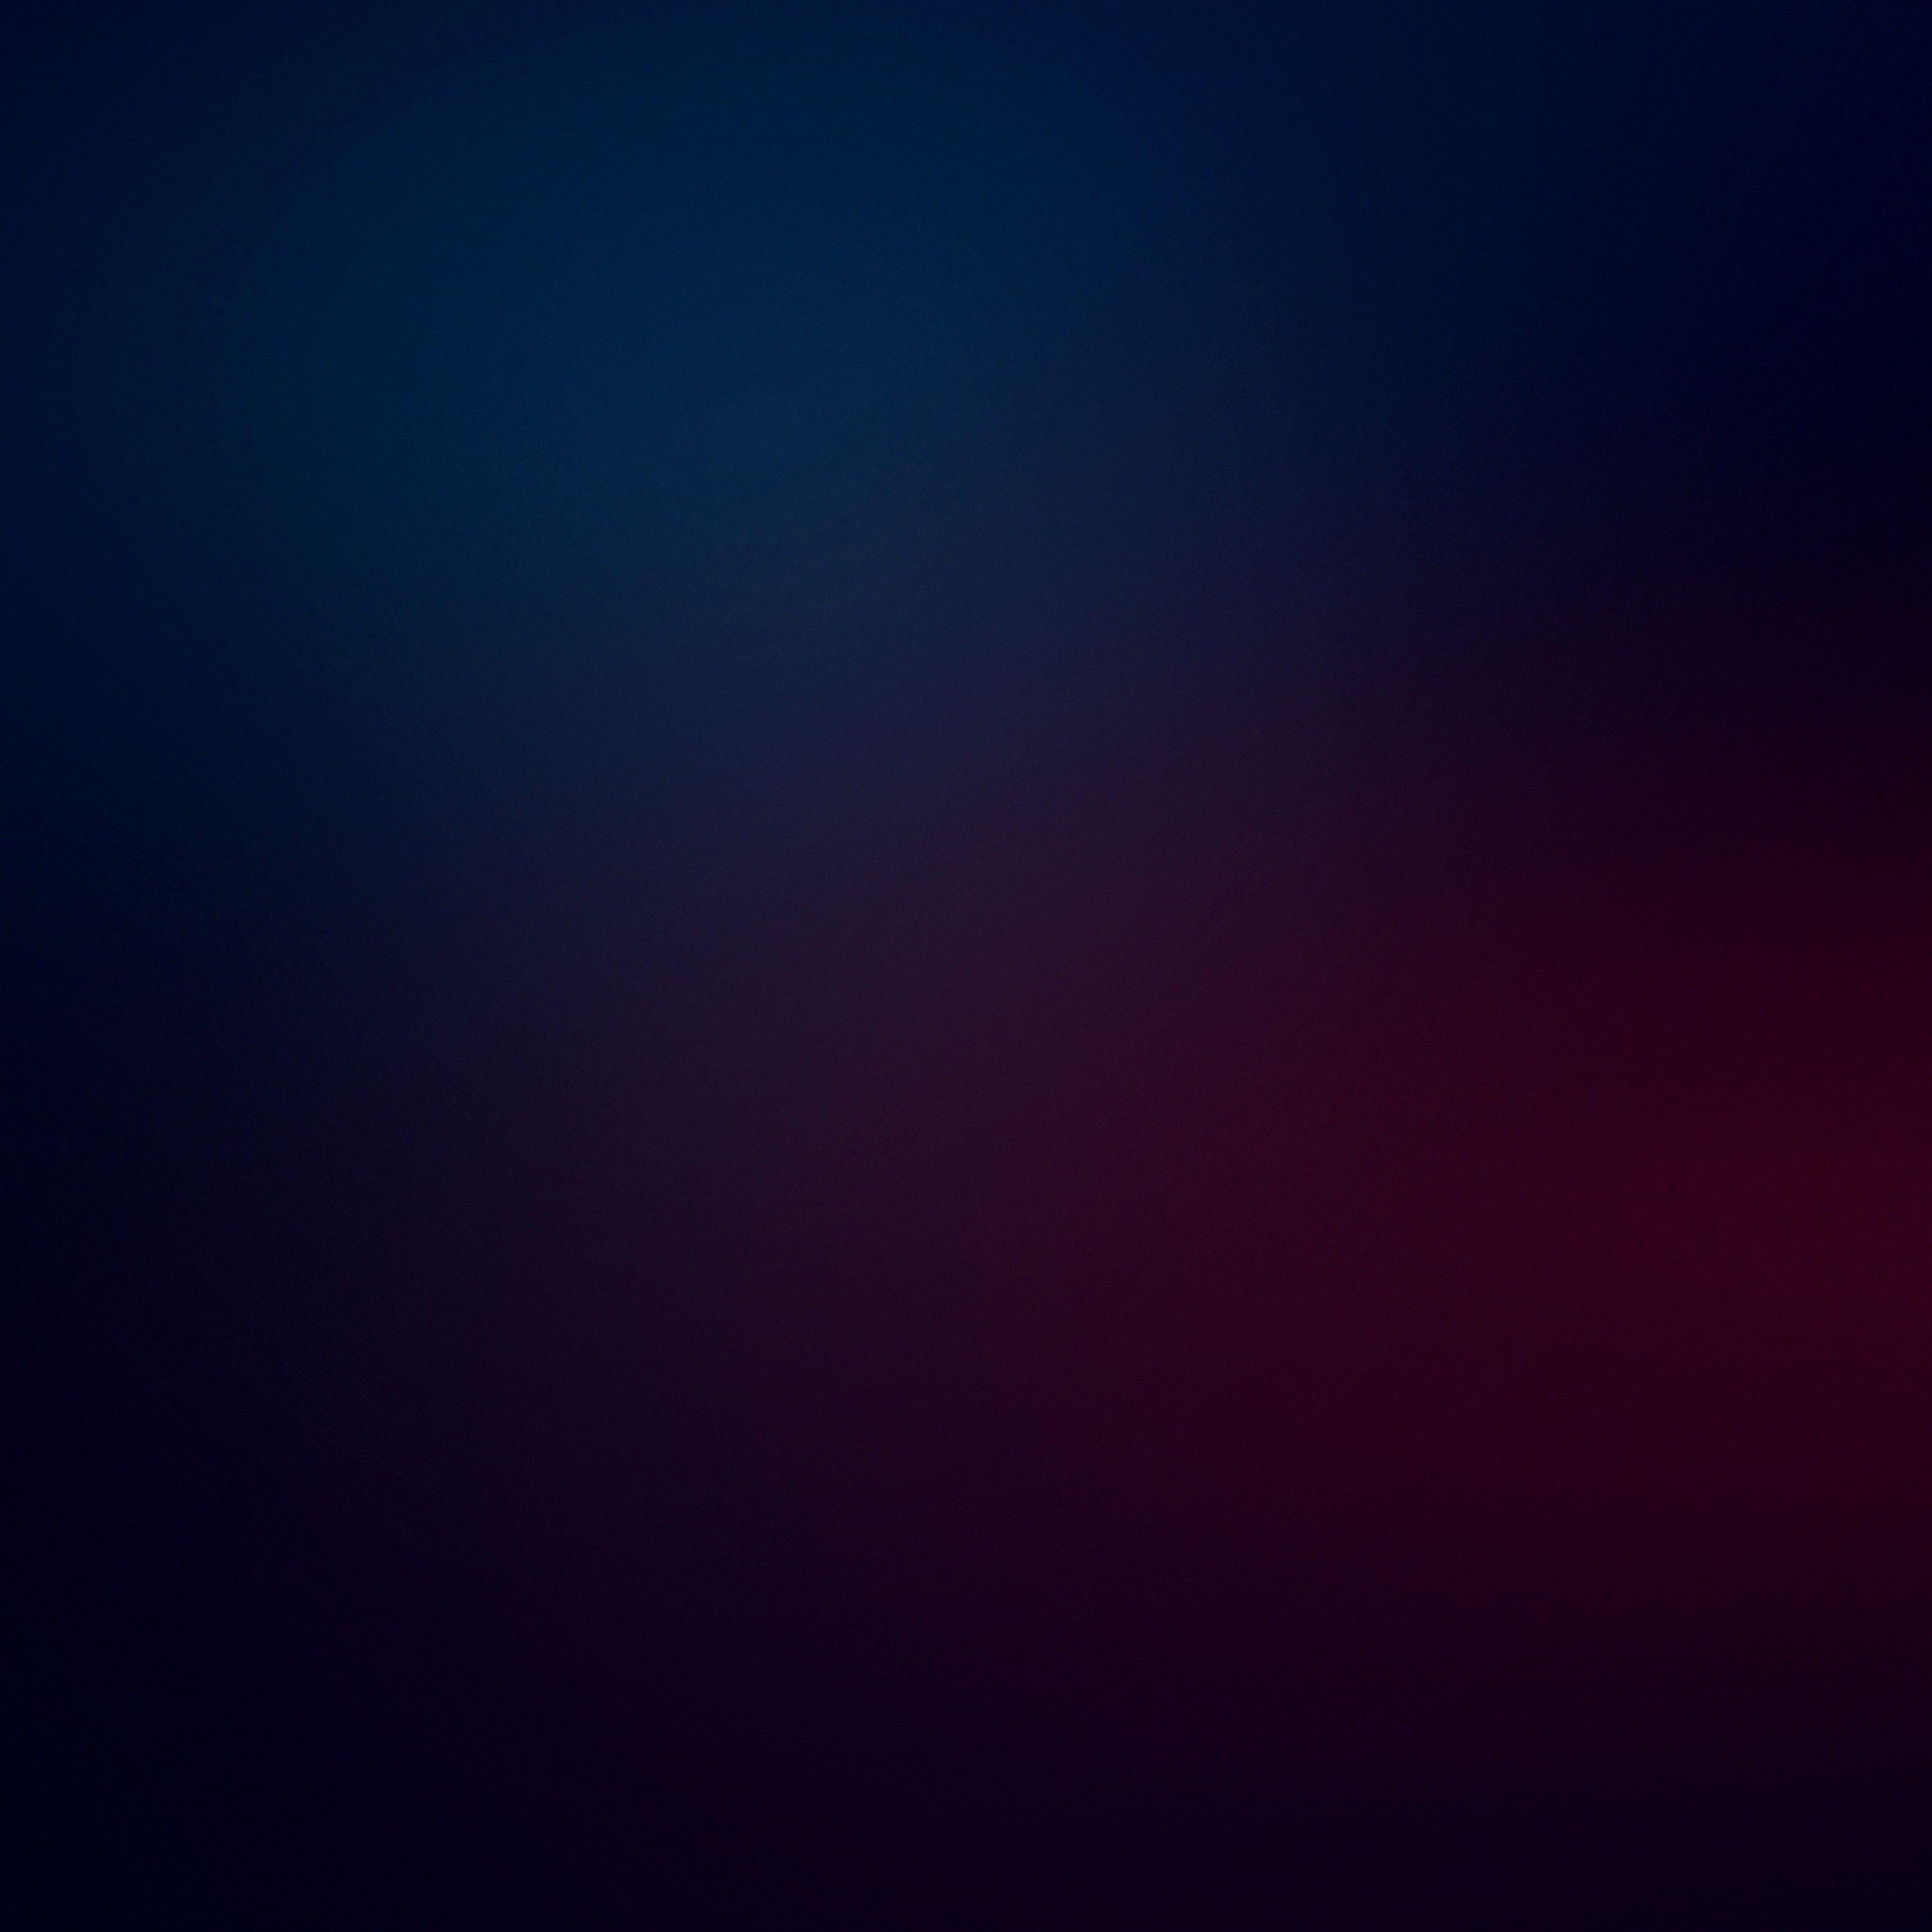 Ipad Pro Wallpaper 4K Abstract Ideas - wallpaper - #Abstract #Ideas #iPad #pro #...